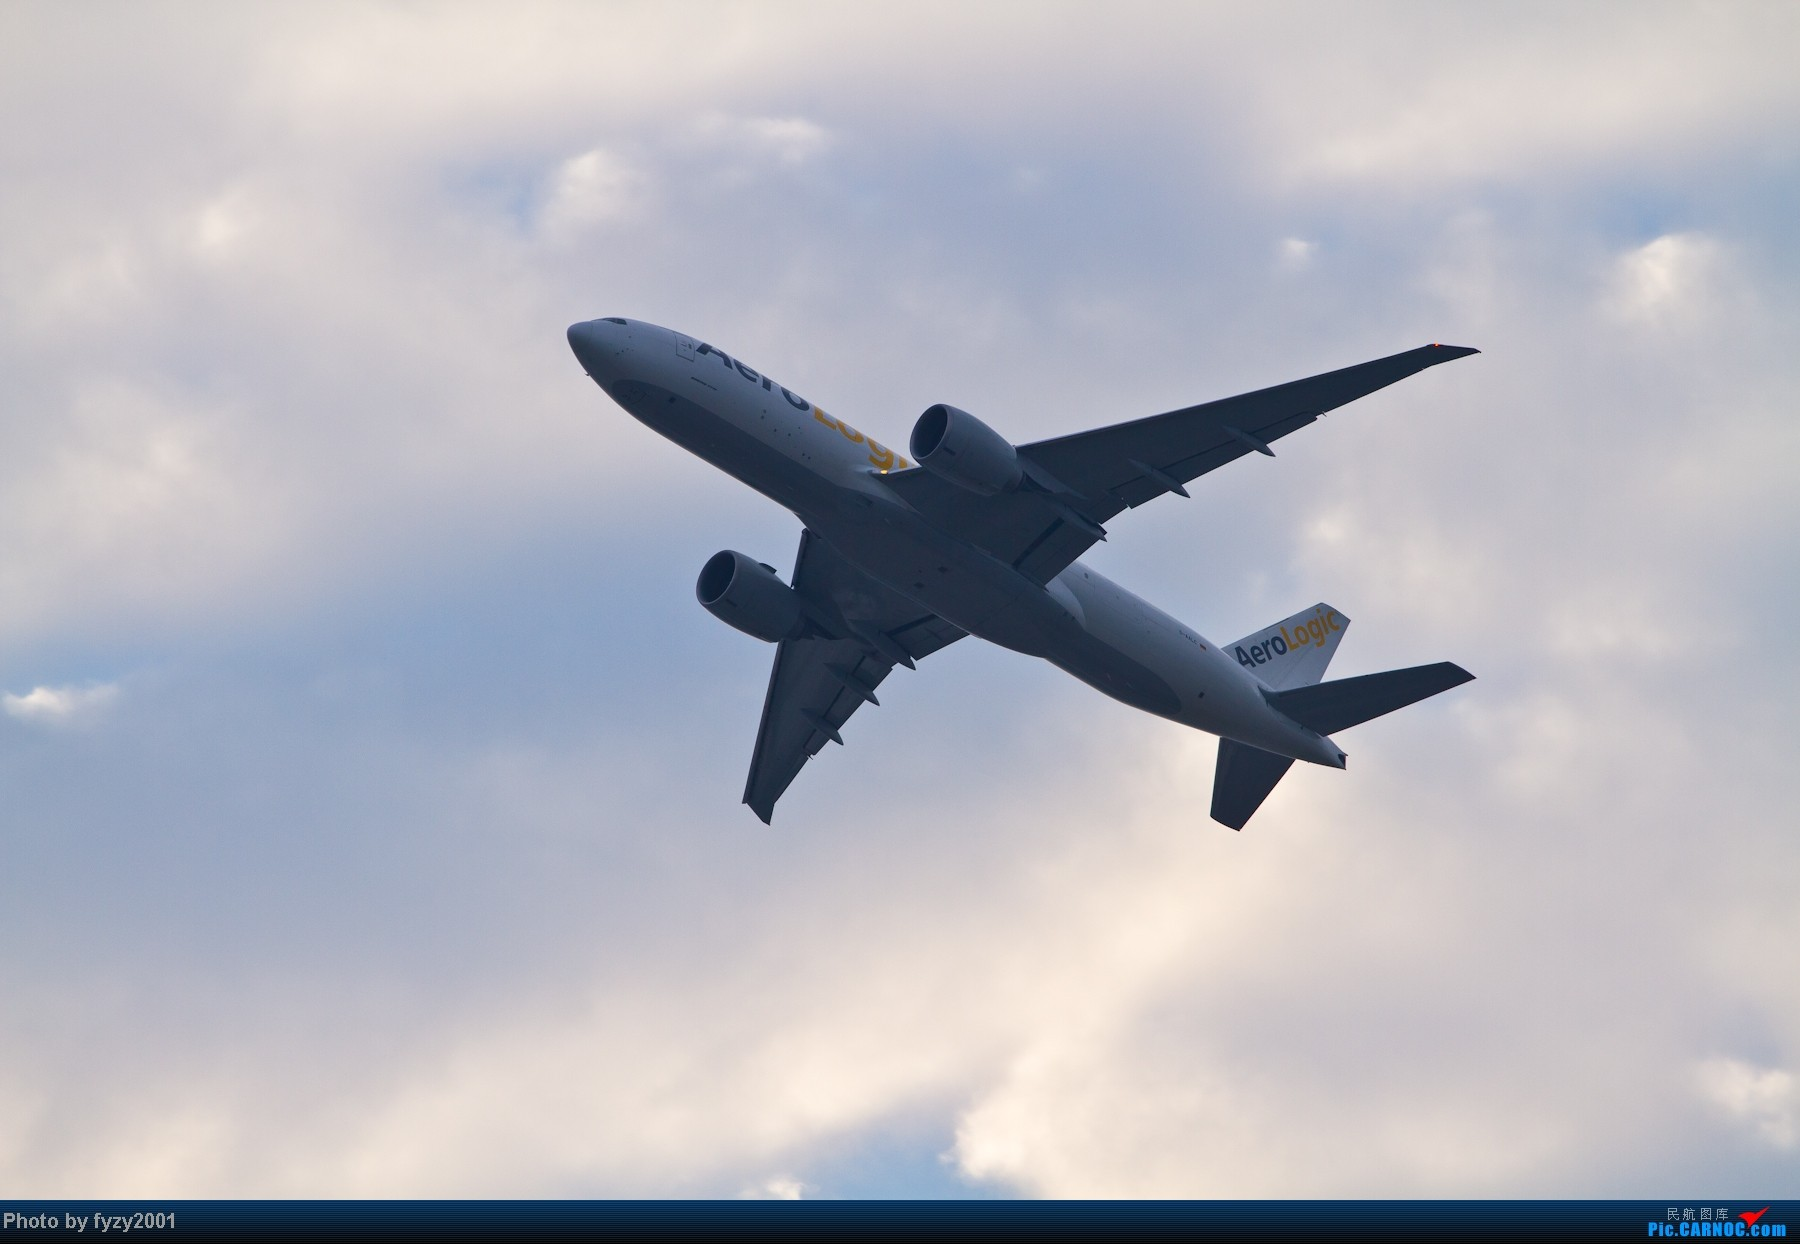 Re:[原创][无锡西站]长假PVG蹲守~~~~只发大图,多图杀猫~~~~ BOEING 777 D-AALC 中国上海浦东机场